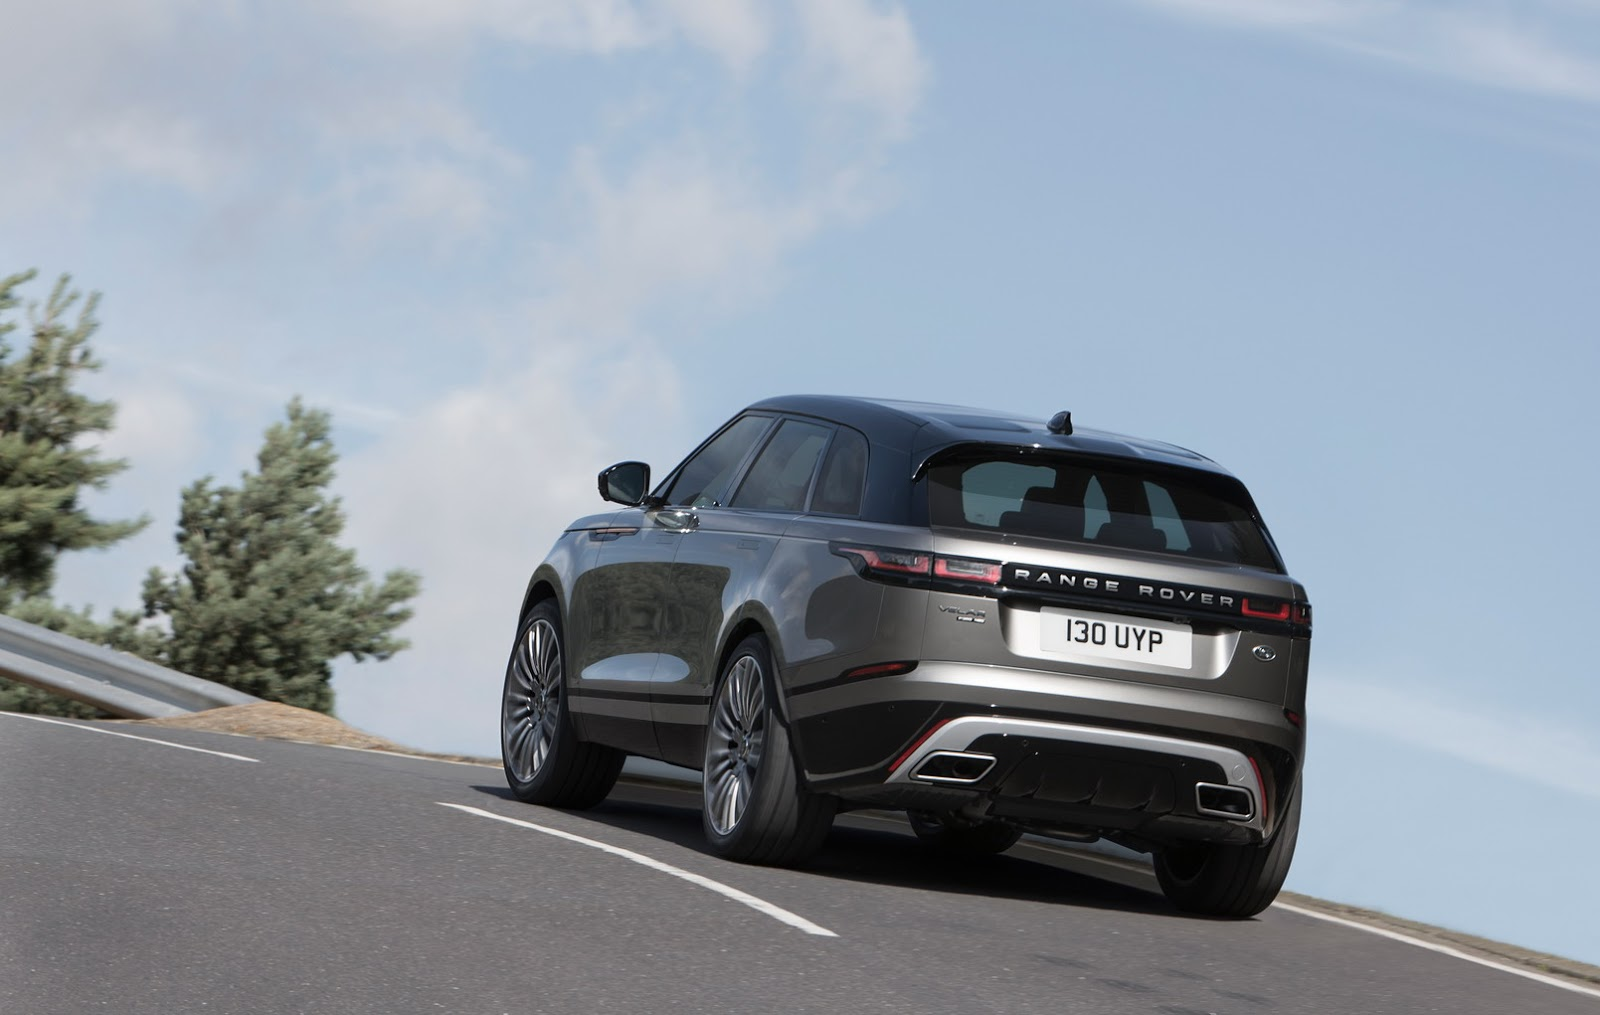 Jaguar Land Rover Models To Adopt New Nomenclature Carscoops - Jag land rover